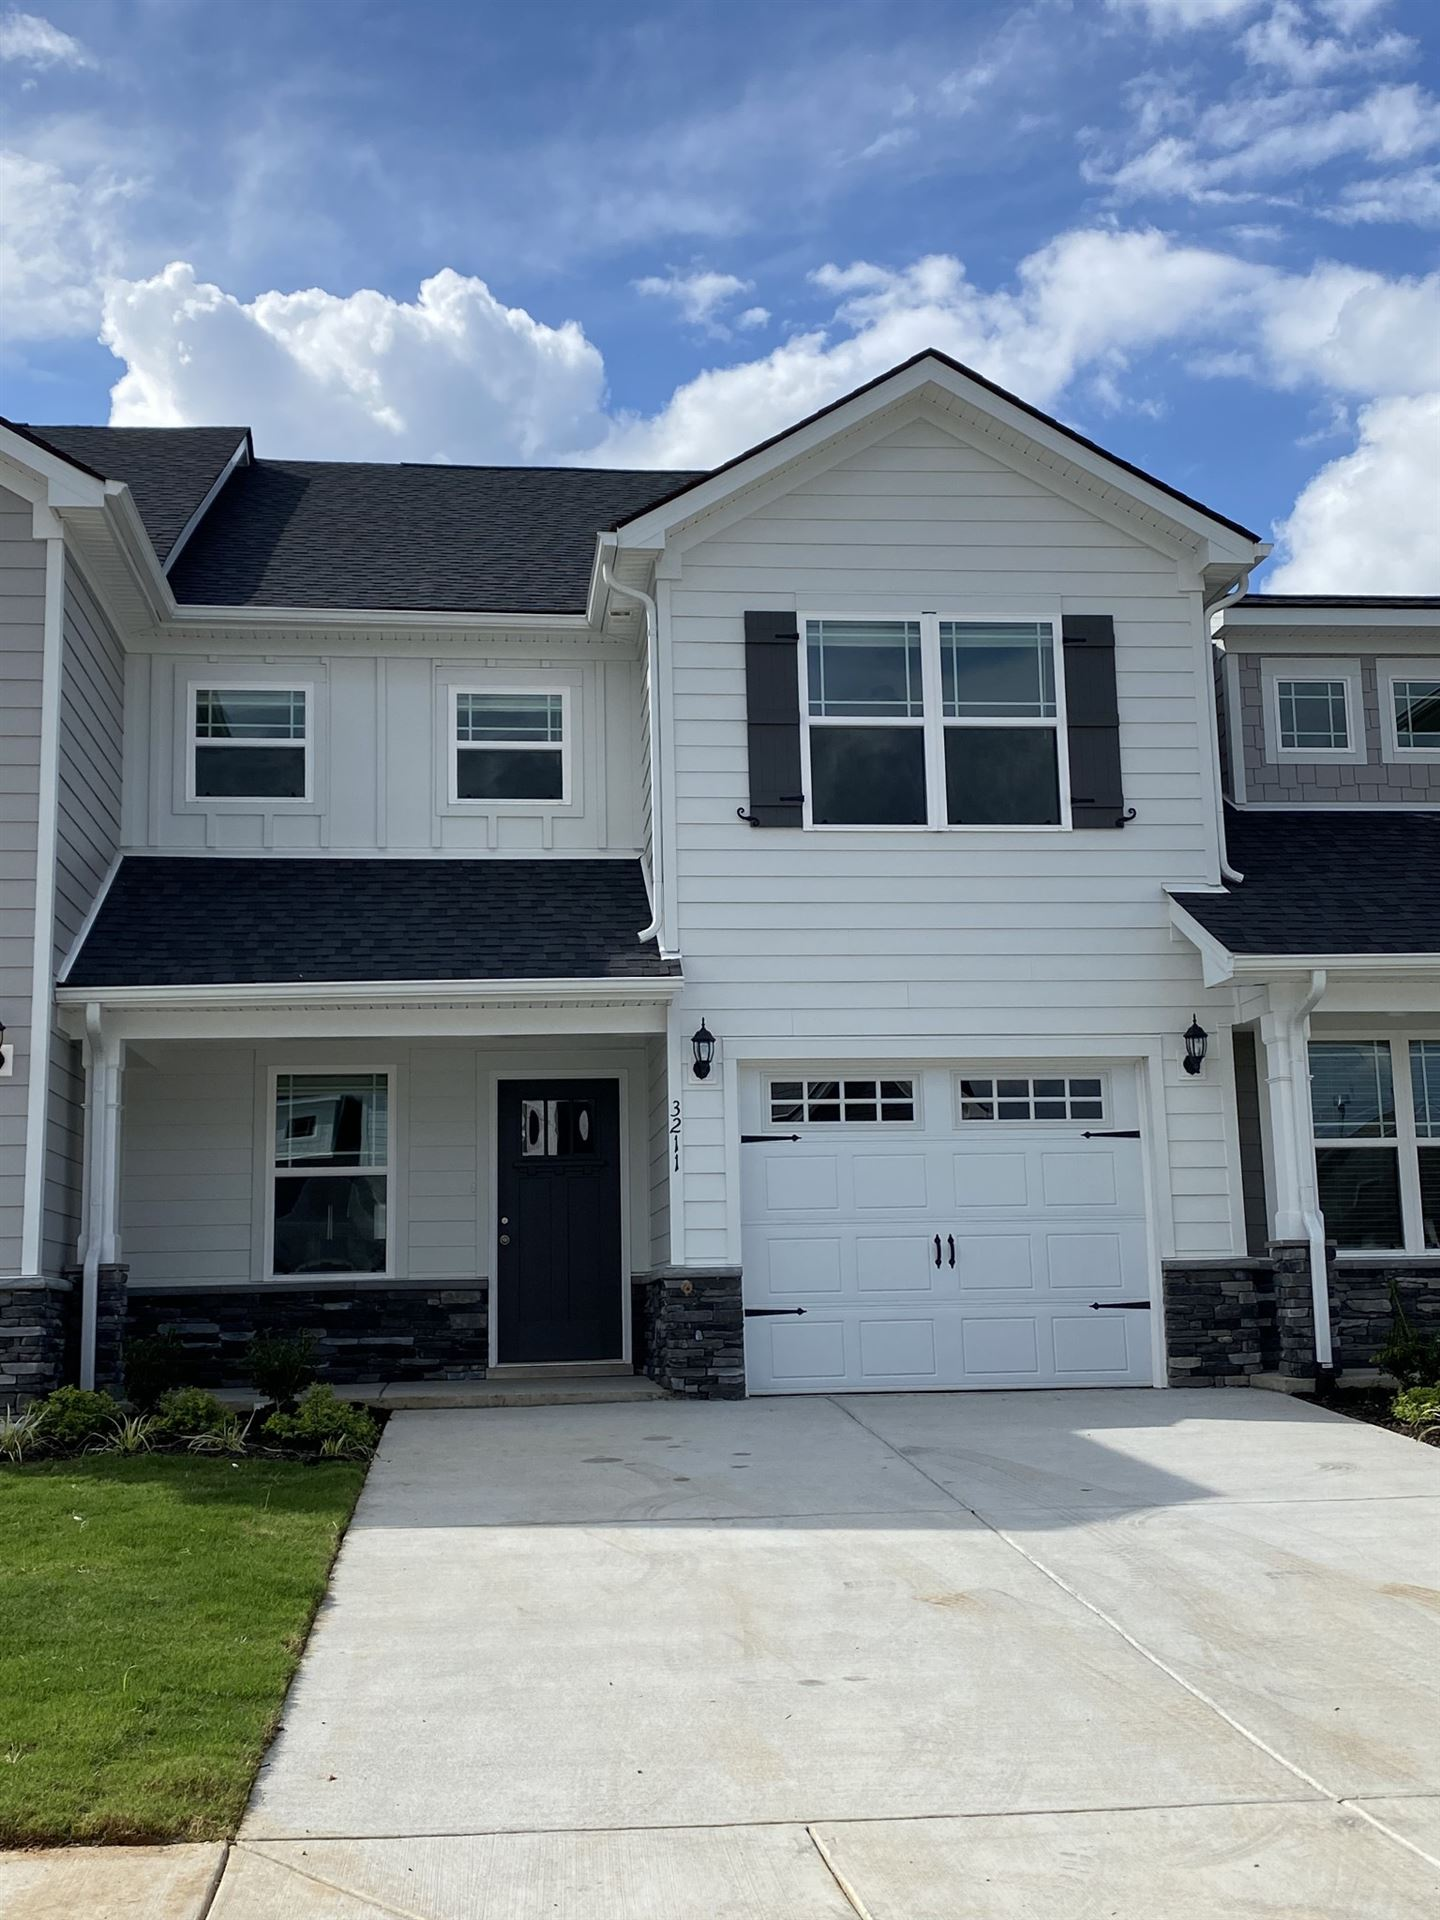 Photo of 5317 Normandy Cob Drive lot 51 #51, Murfreesboro, TN 37129 (MLS # 2299226)